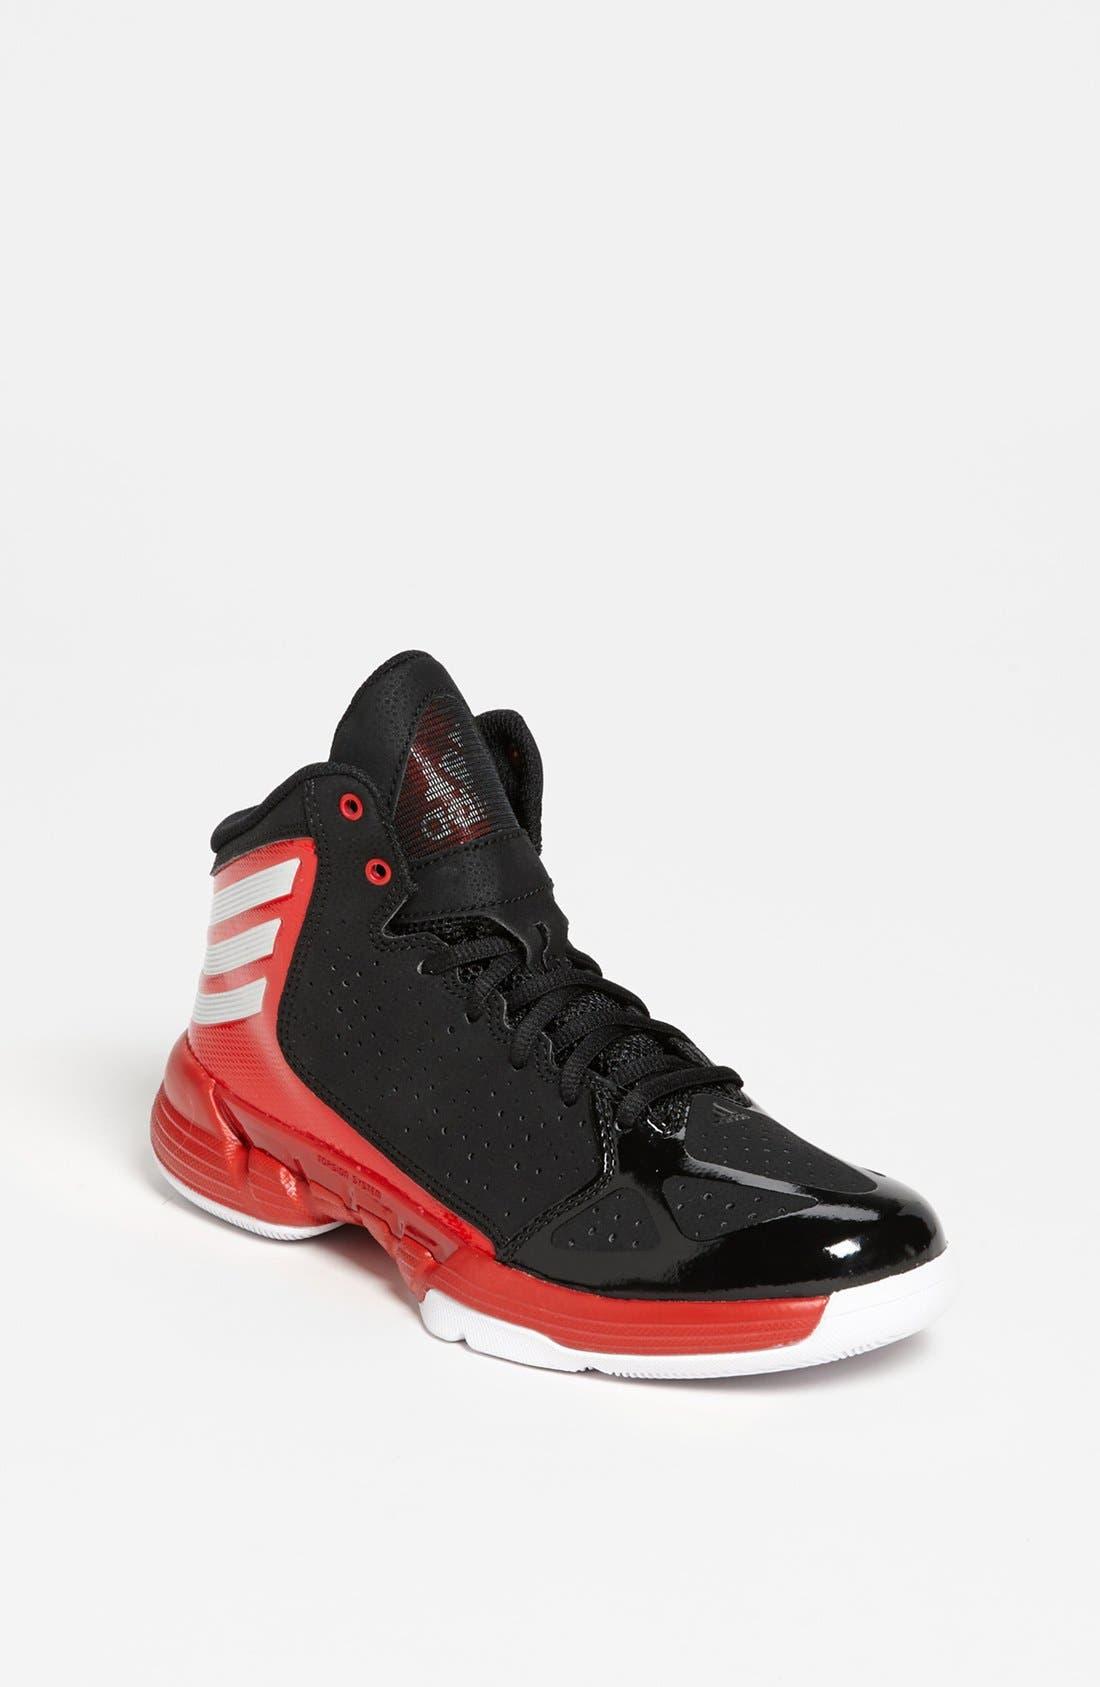 Alternate Image 1 Selected - adidas 'Mad Handle' Basketball Shoe (Big Kid)